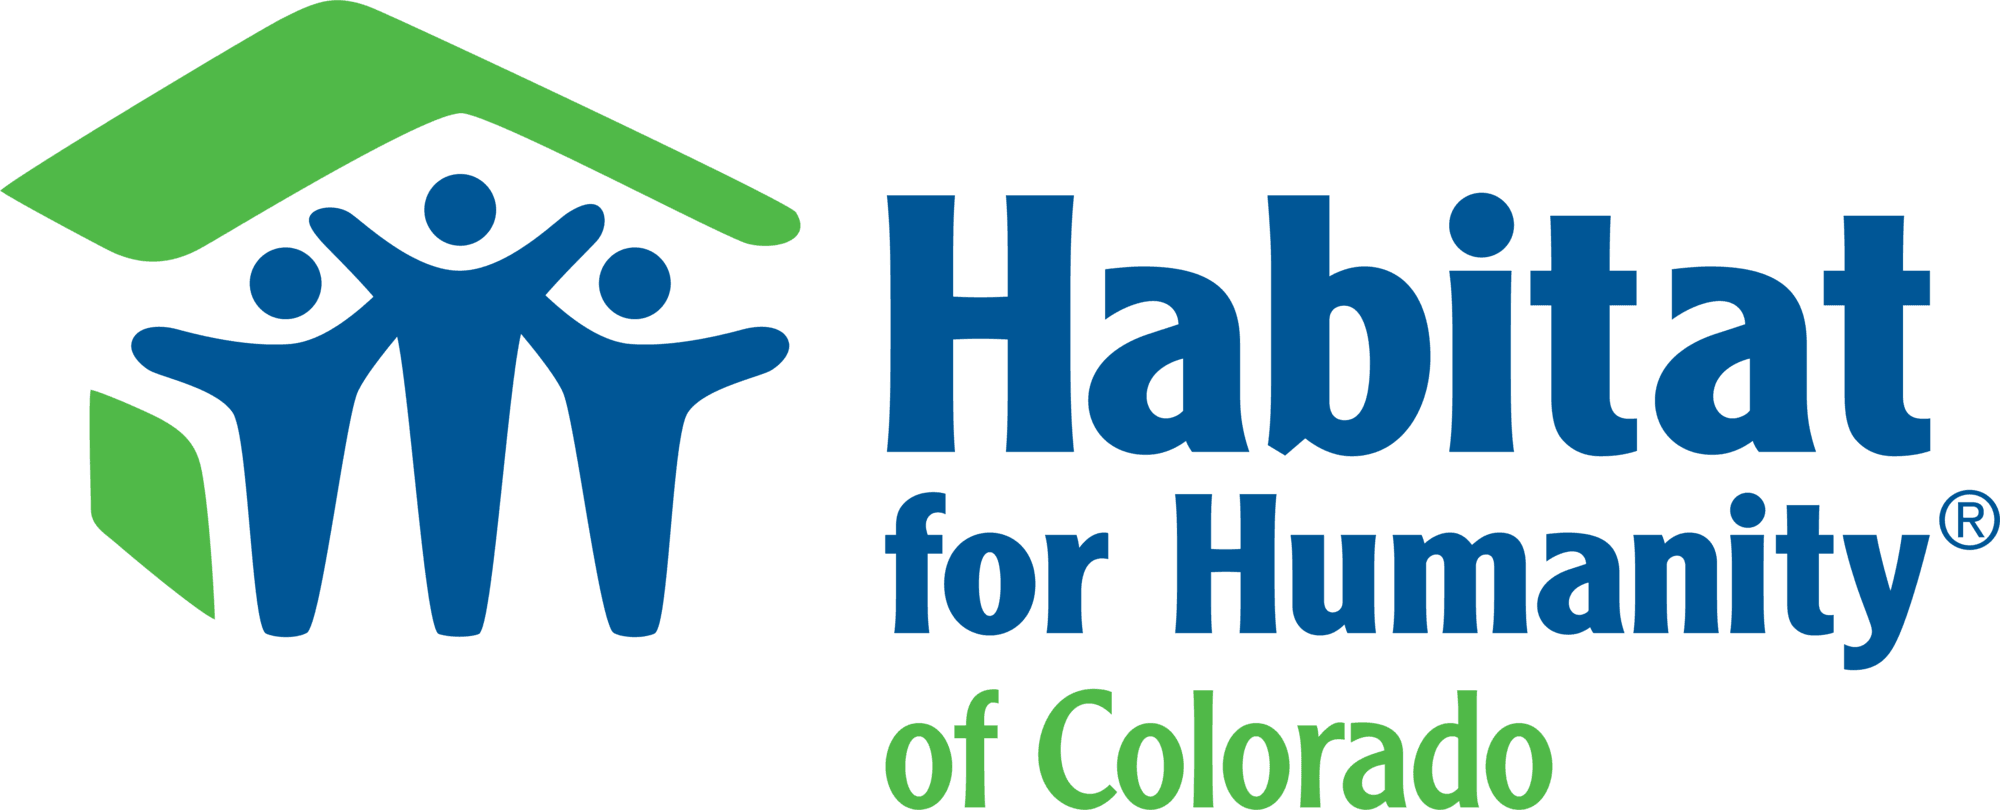 Habitat for Humanity Colorado thumbnail